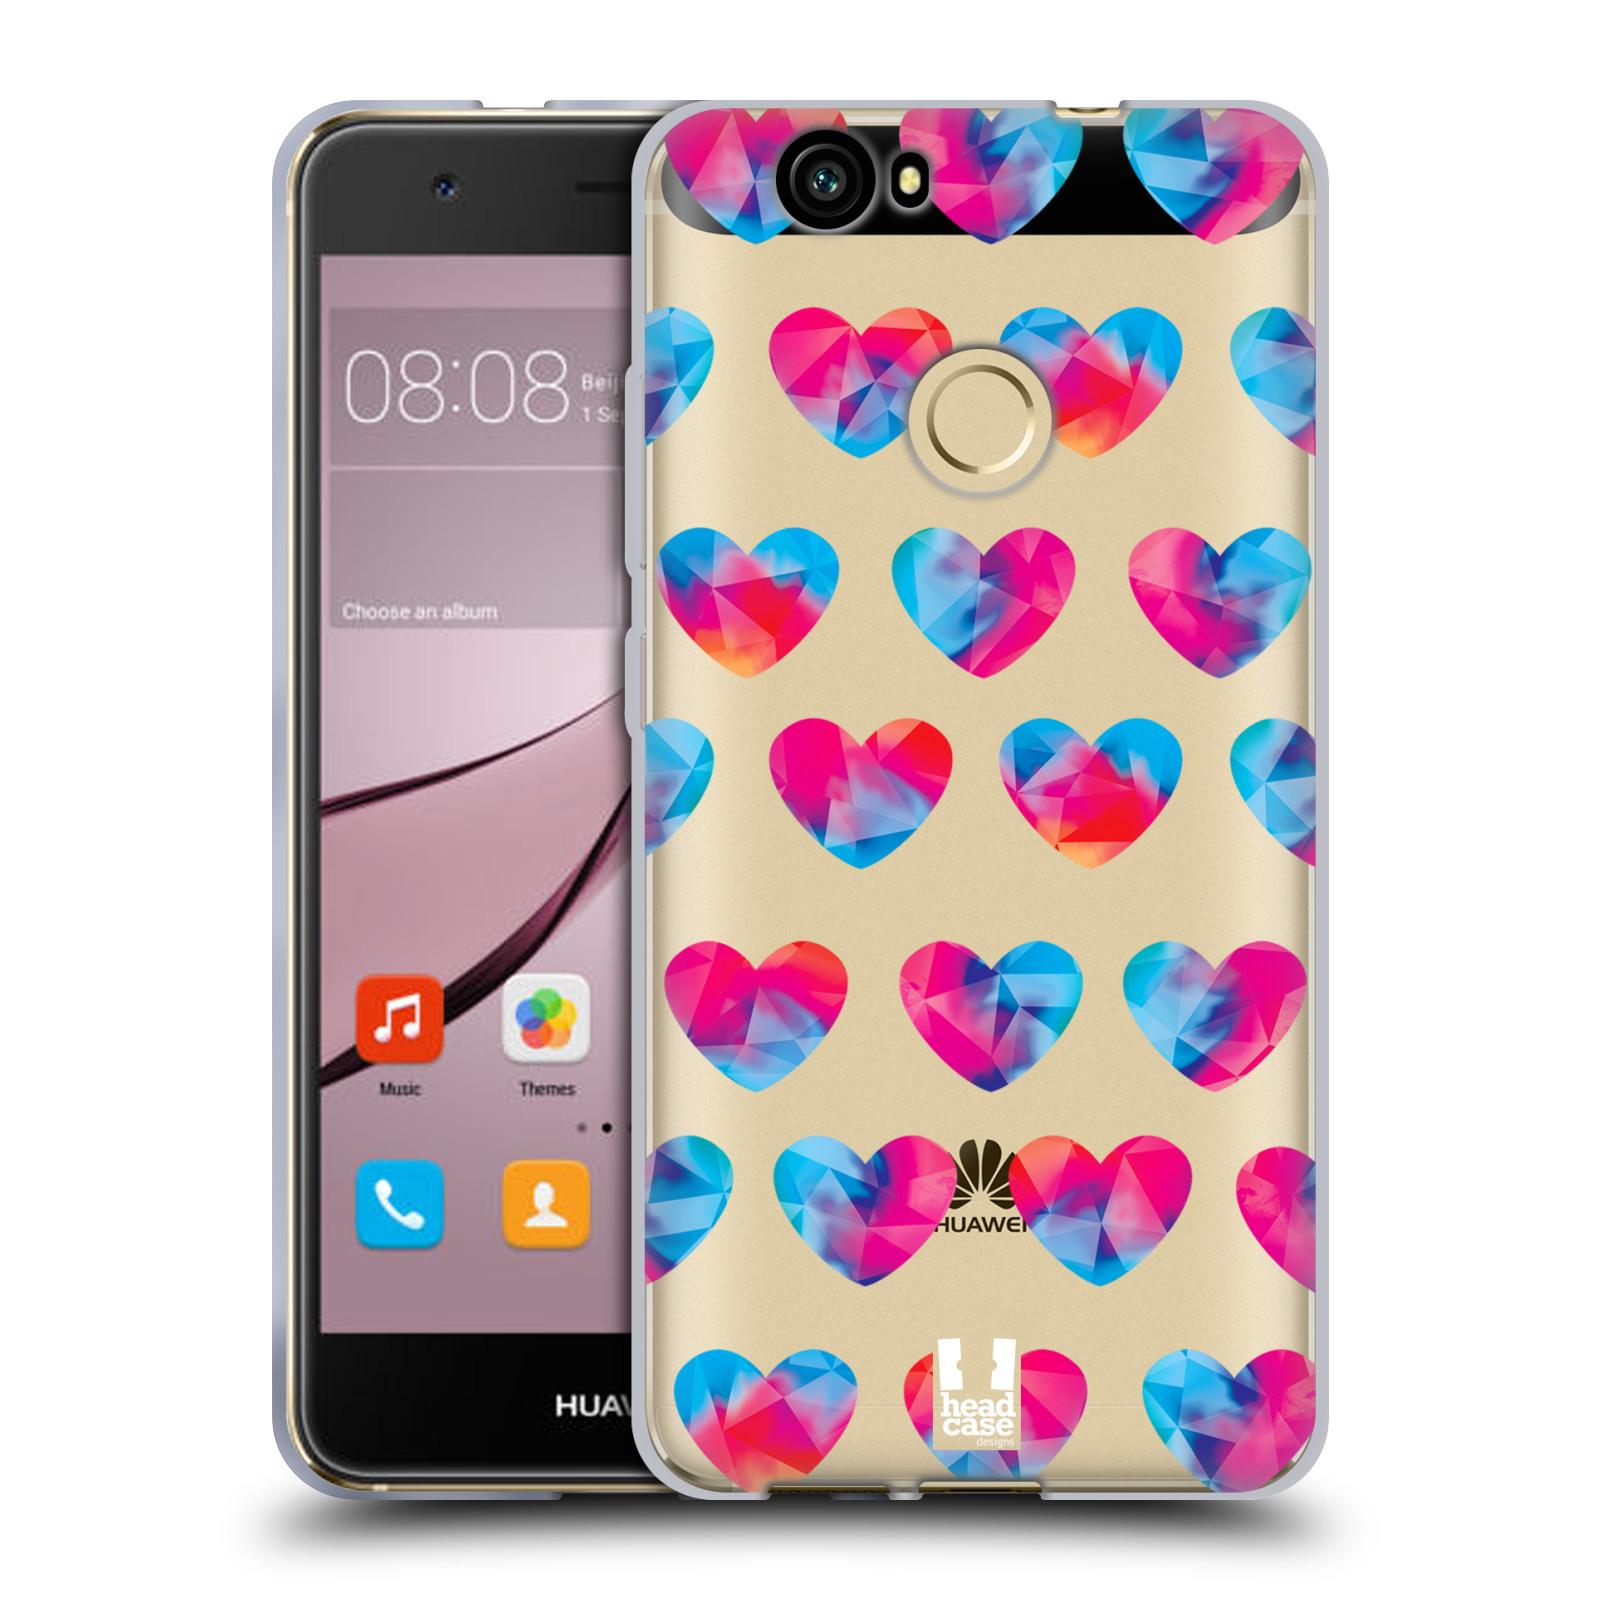 Silikonové pouzdro na mobil Huawei Nova - Head Case - Srdíčka hrající barvami